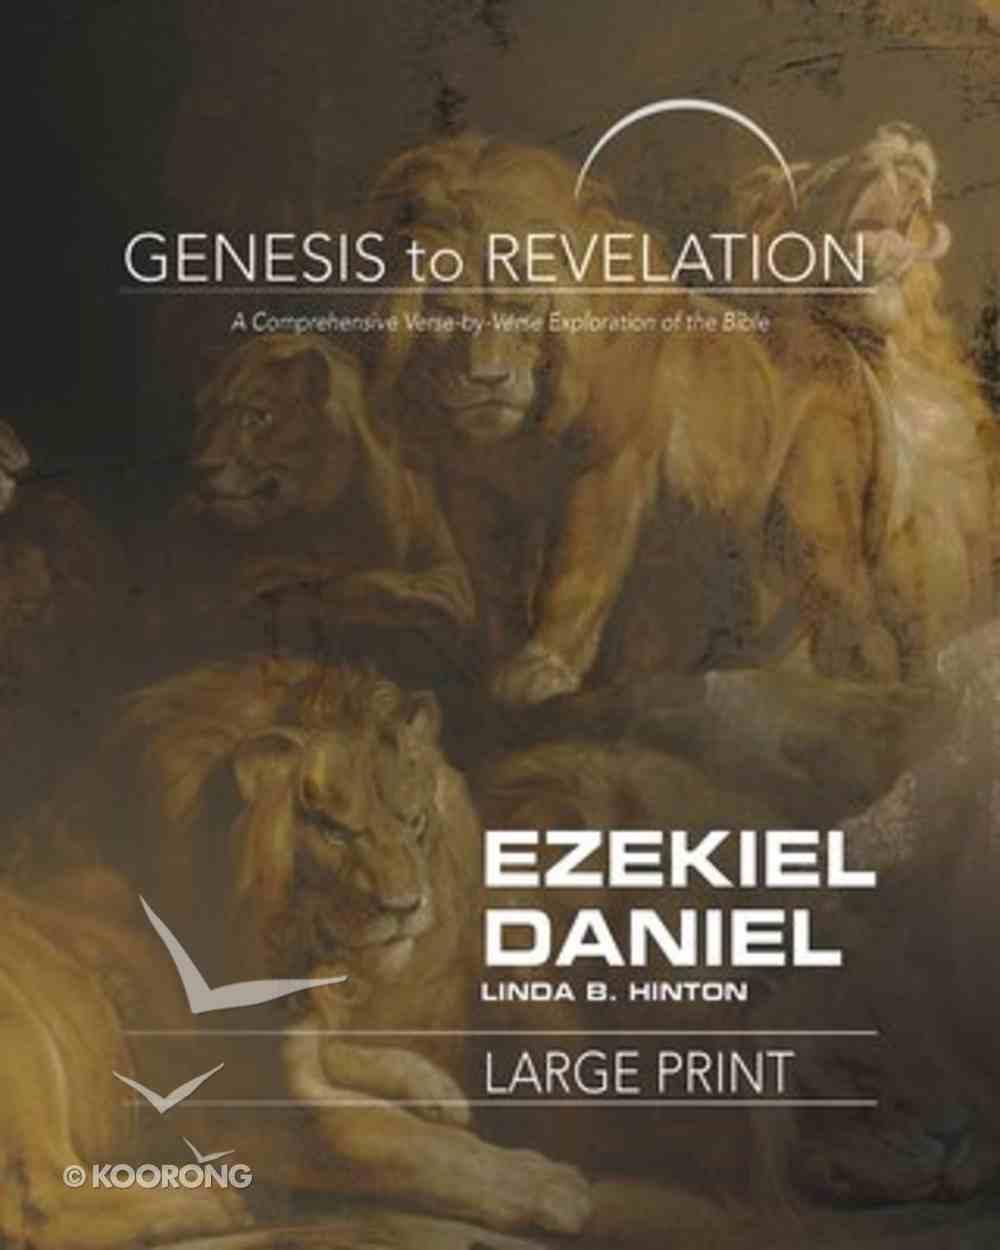 Ezekiel, Daniel : A Comprehensive Verse-By-Verse Exploration of the Bible (Participant Book, Large Print) (Genesis To Revelation Series) Paperback